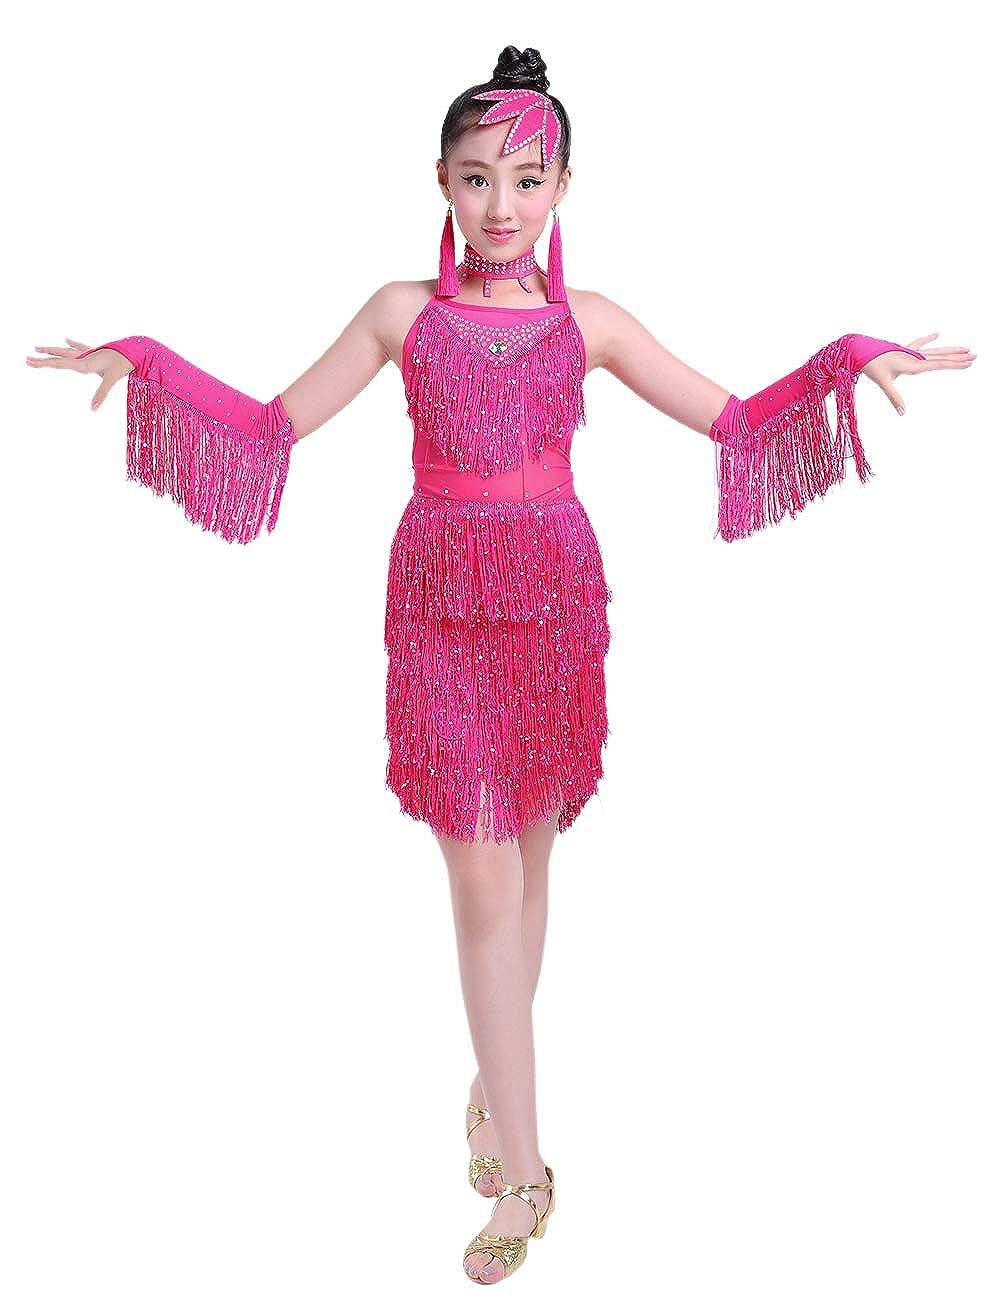 BESBOMIG Tassel Sequins Latin Dance Dress Girls Party Kids Performance Dancewear